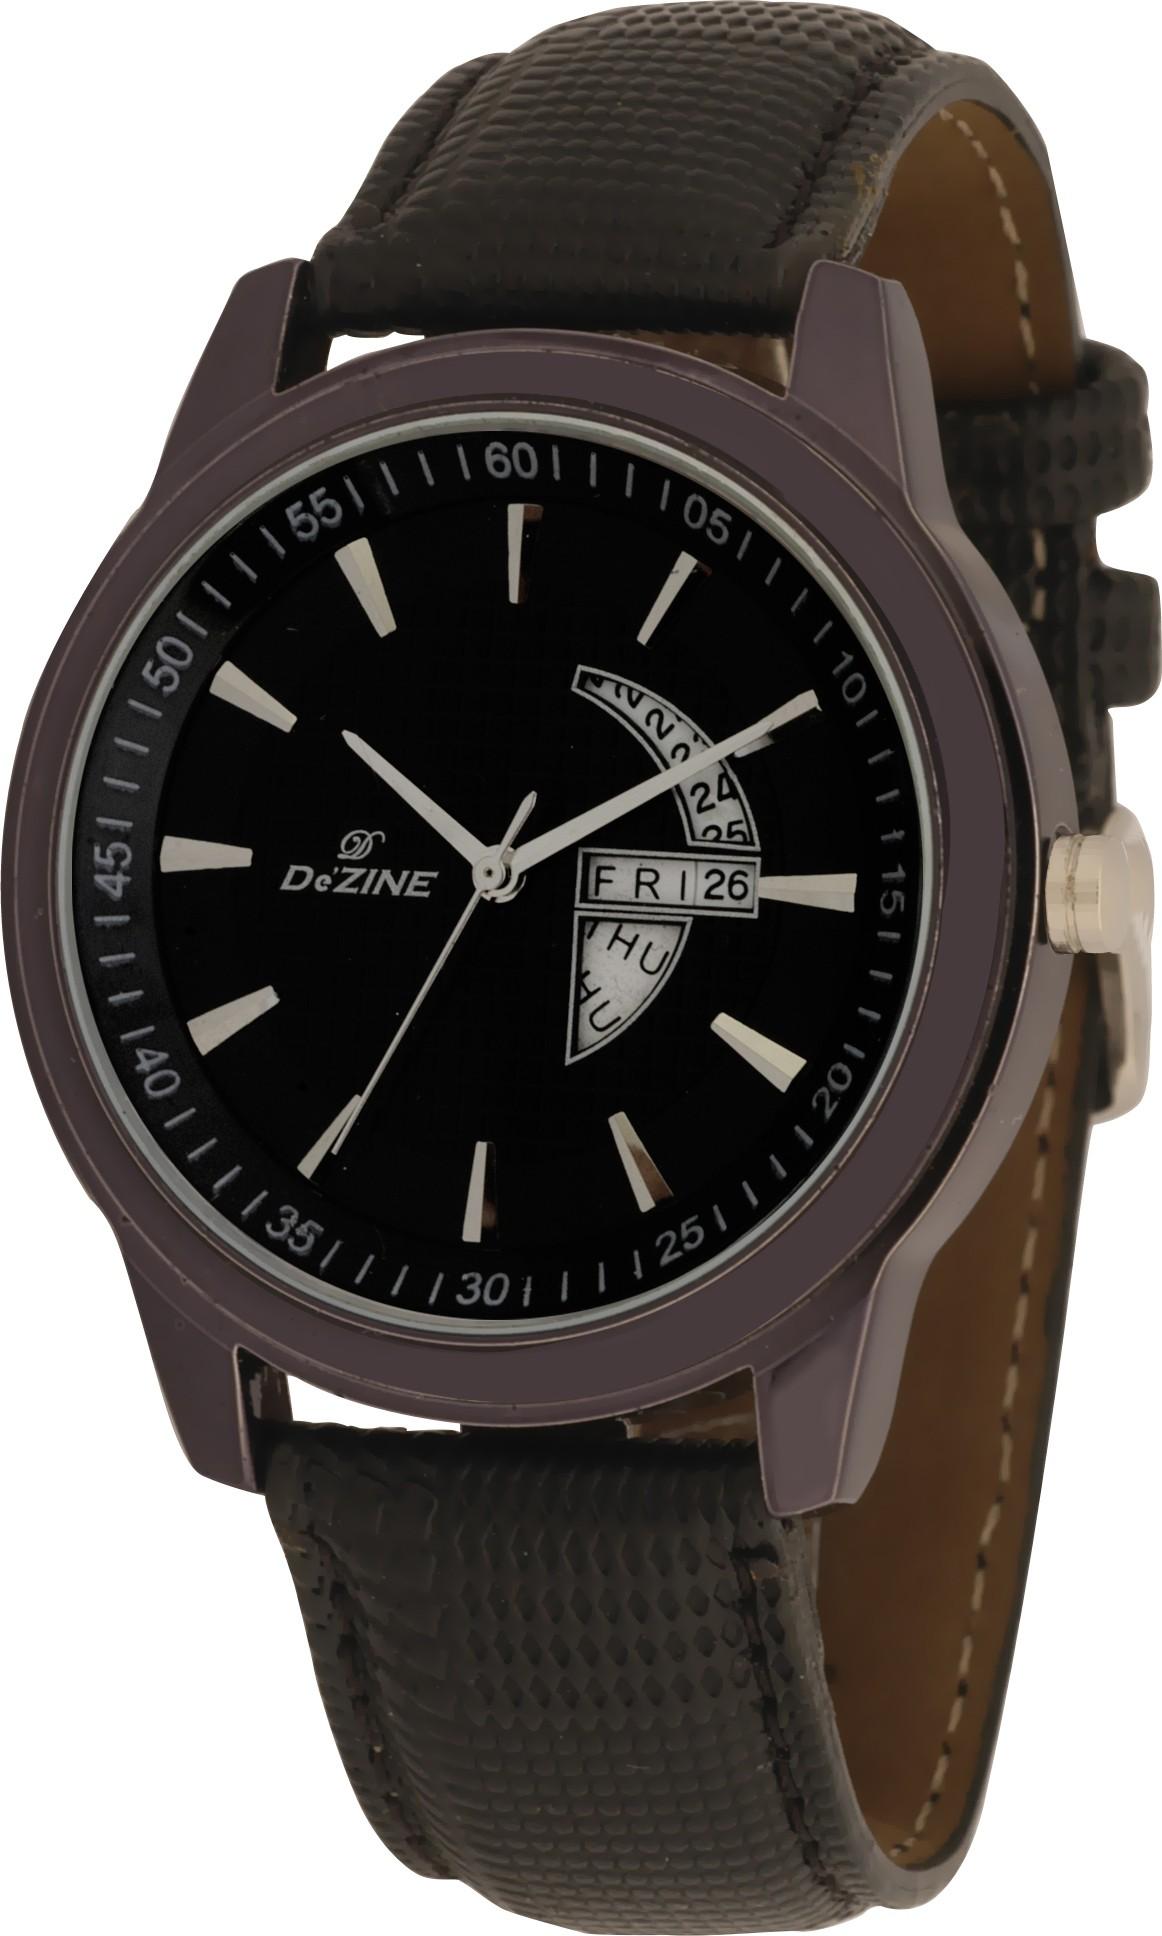 Deals - Delhi - Minimum 50% Off <br> Watches<br> Category - watches<br> Business - Flipkart.com